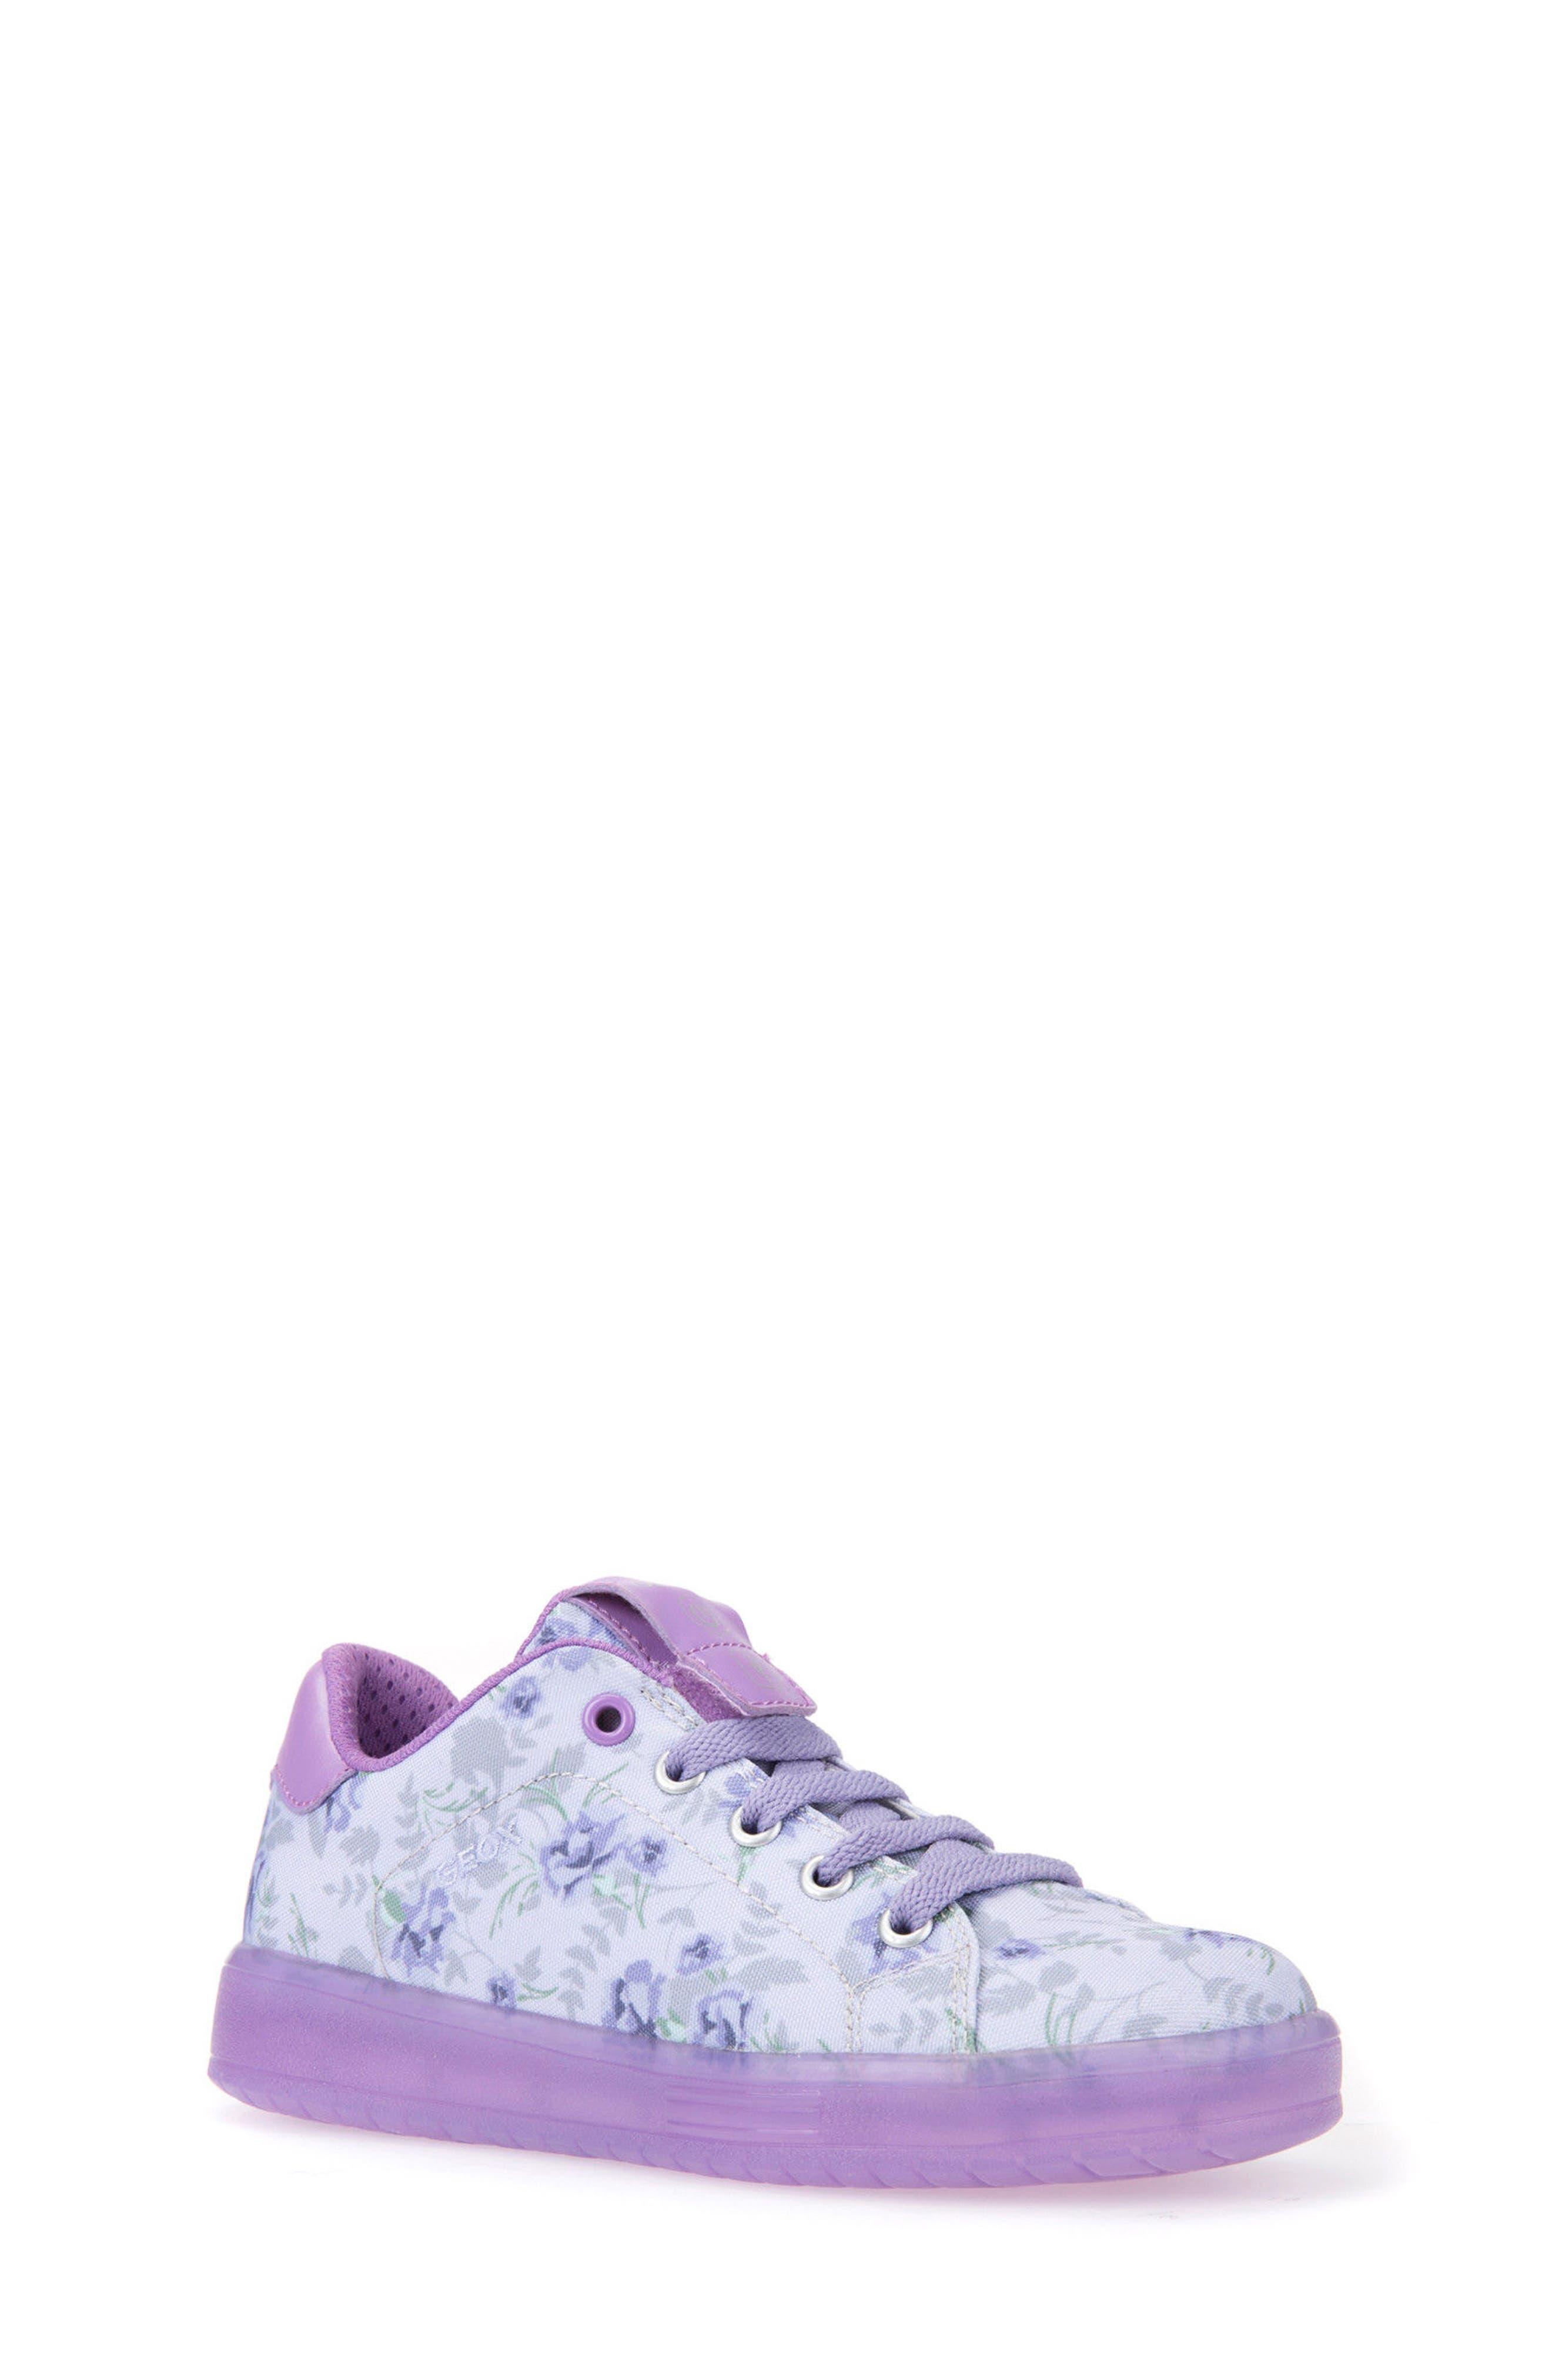 Main Image - Geox Kommodor Light-Up Sneaker (Toddler, Little Kid & Big Kid)